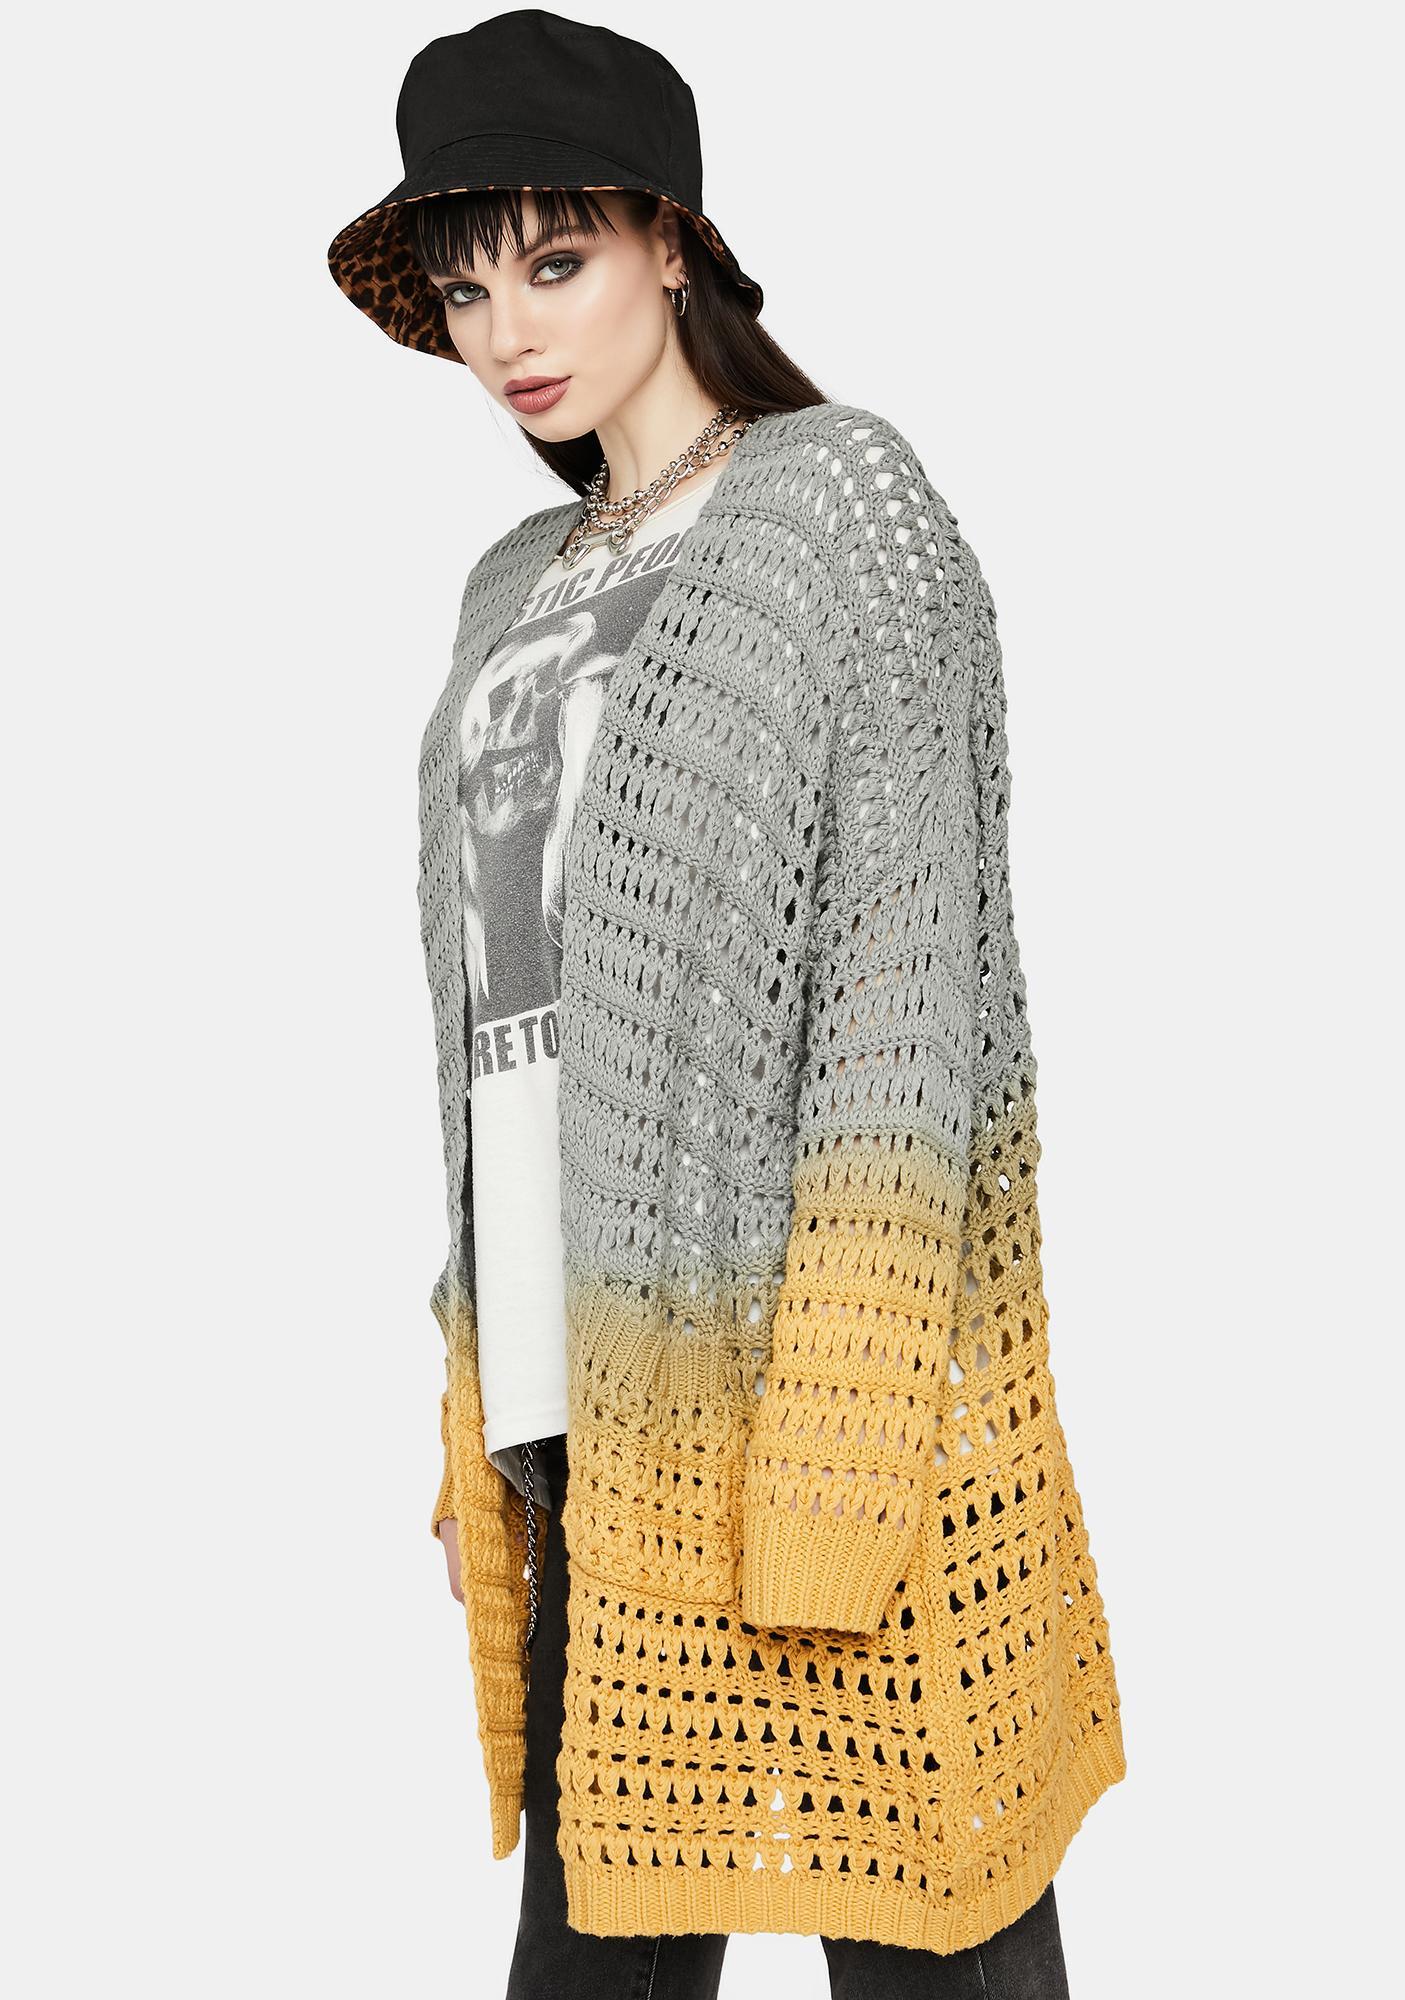 Cozy Couture Crochet Cardigan